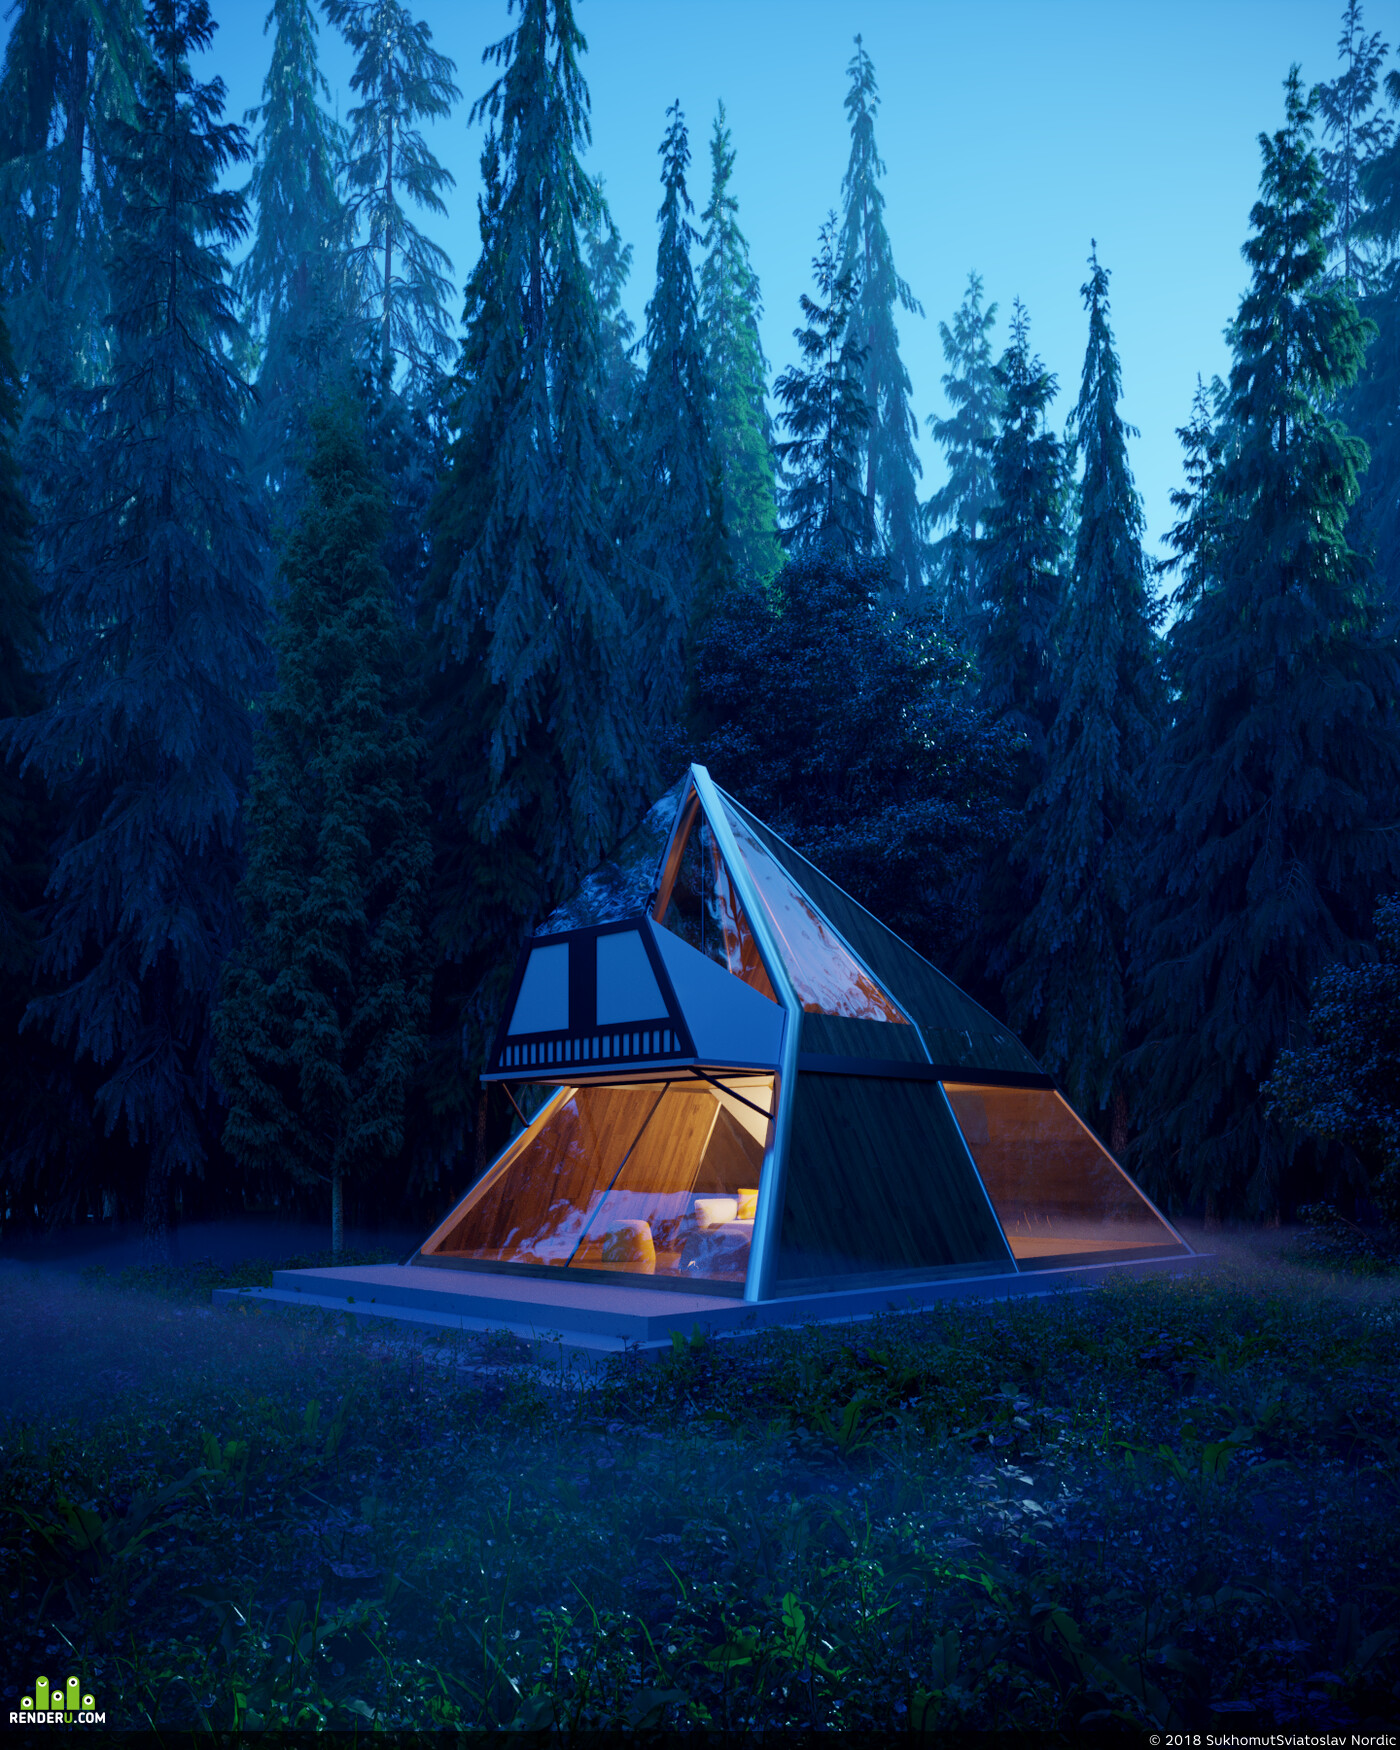 архитектура, 3D архитектура, архитектурная визуализация, архитектурная концепция, лес, приключения